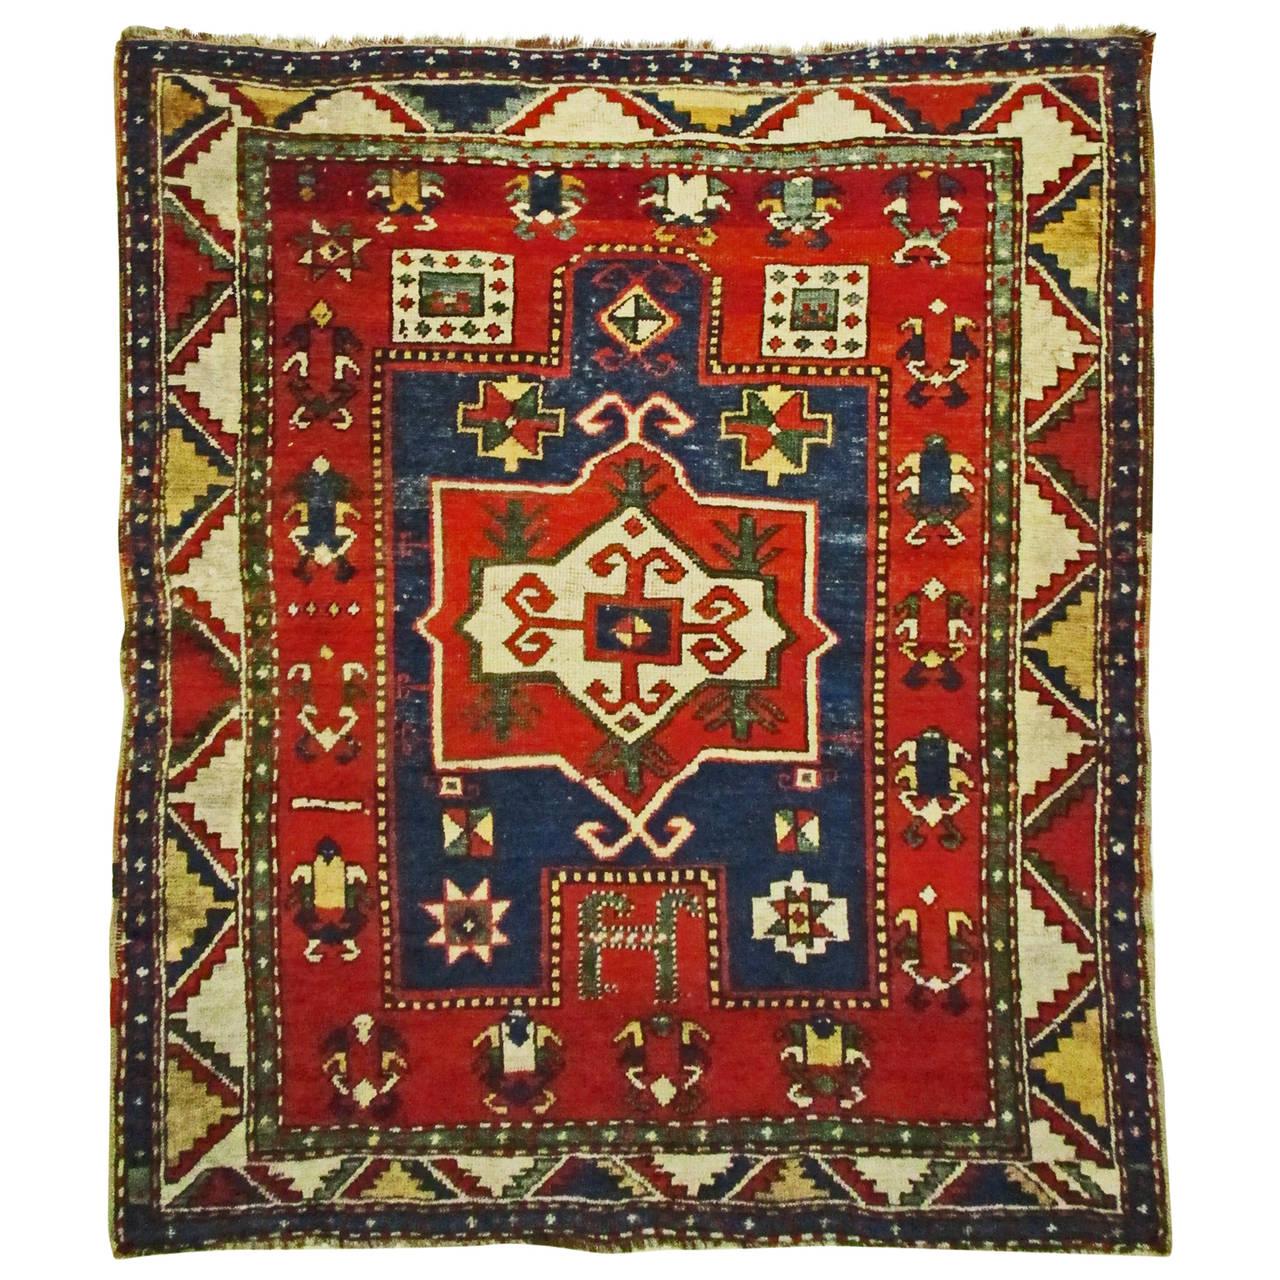 Fachralo Kazak Prayer Rug Last Quarter Of 19th Century At